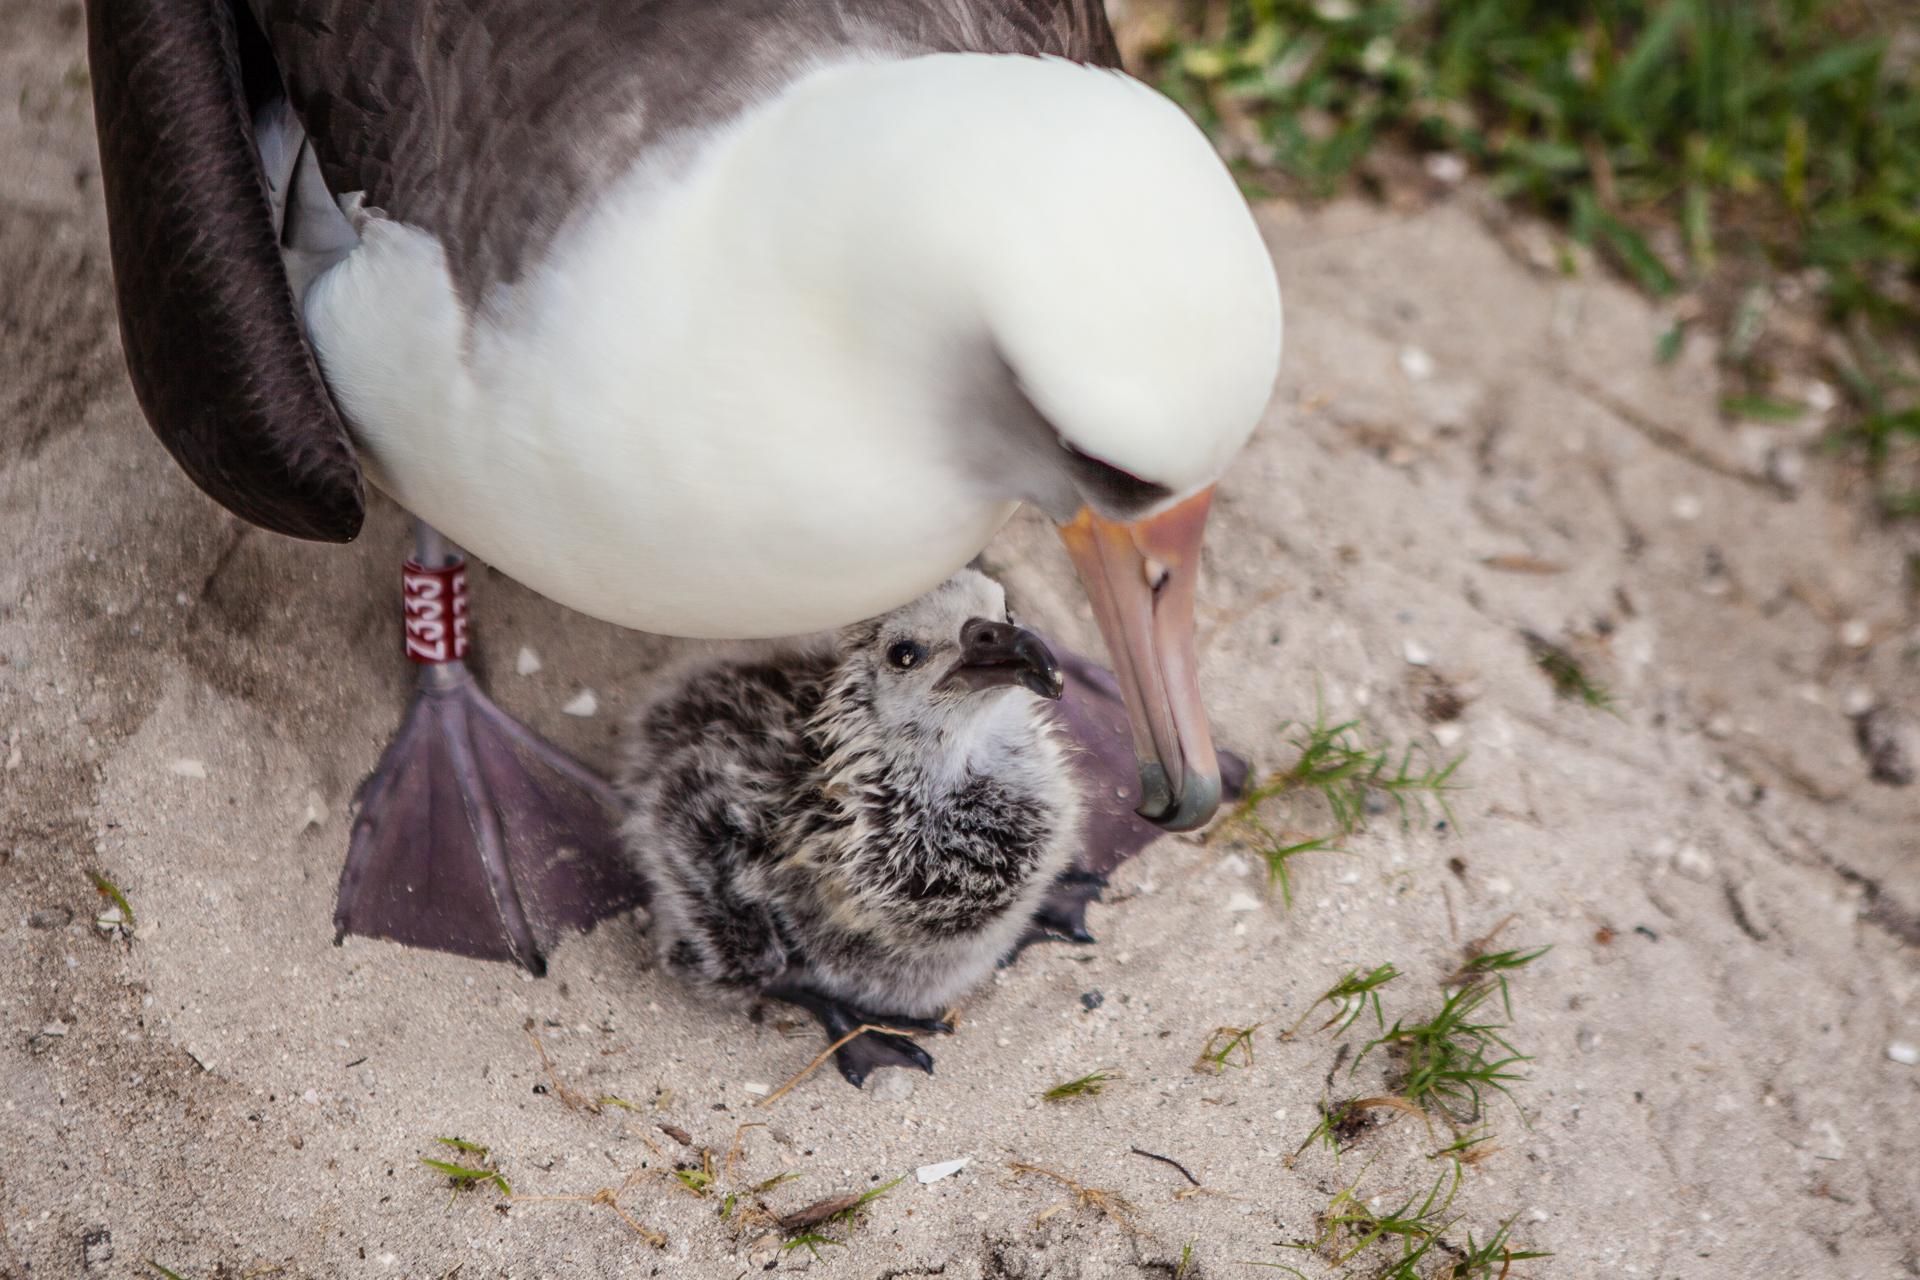 New chick for oldest wild bird Wisdom | Earth | EarthSky